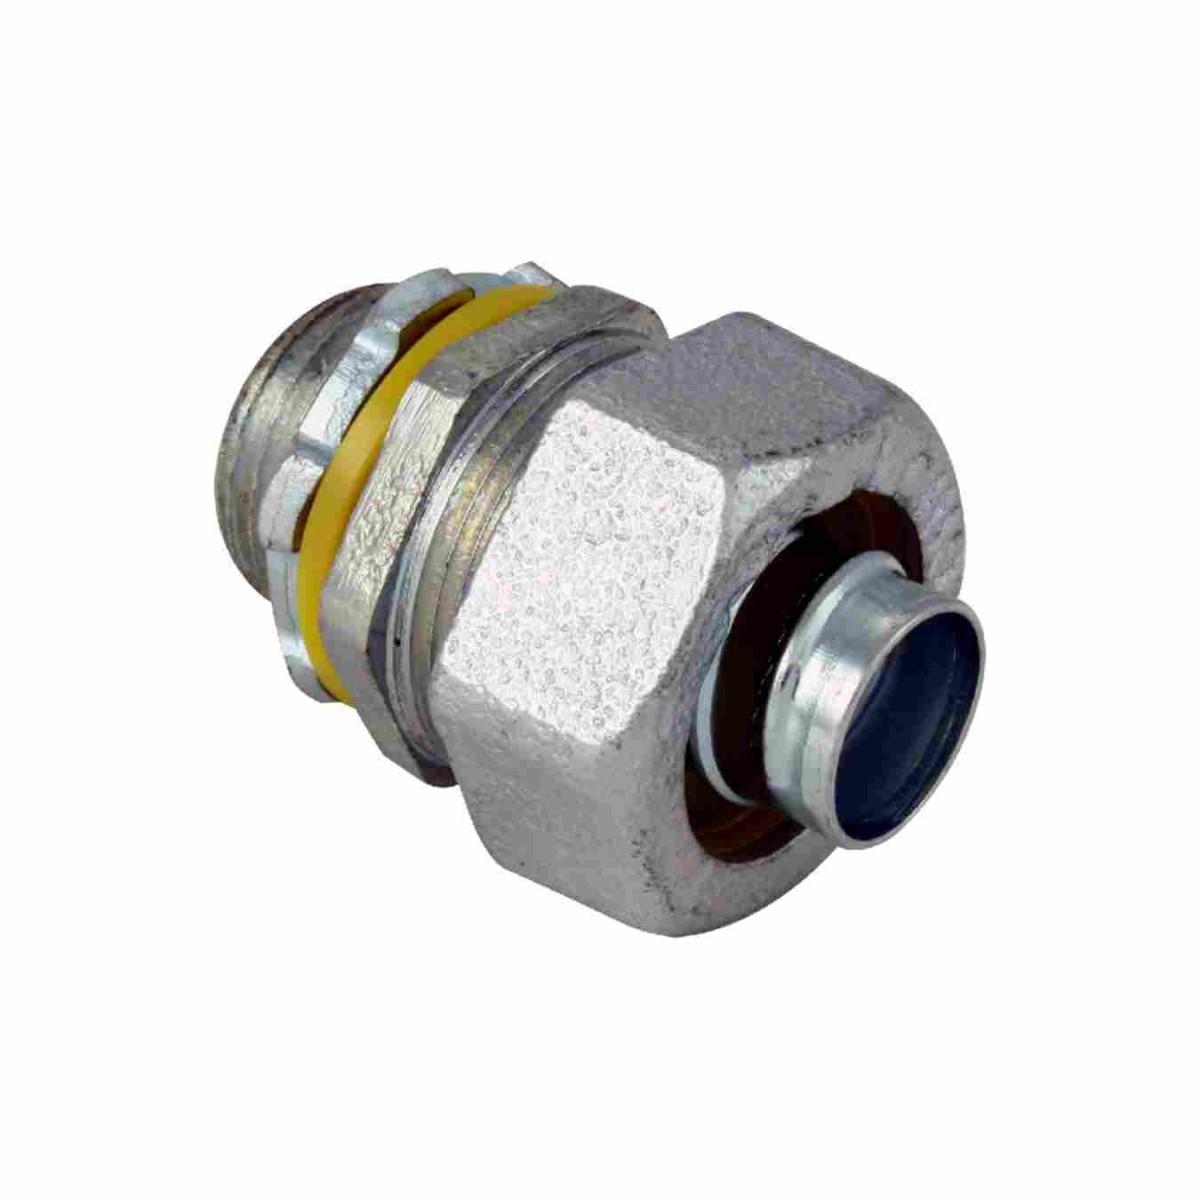 Malleable iron liquid tight connectors straight